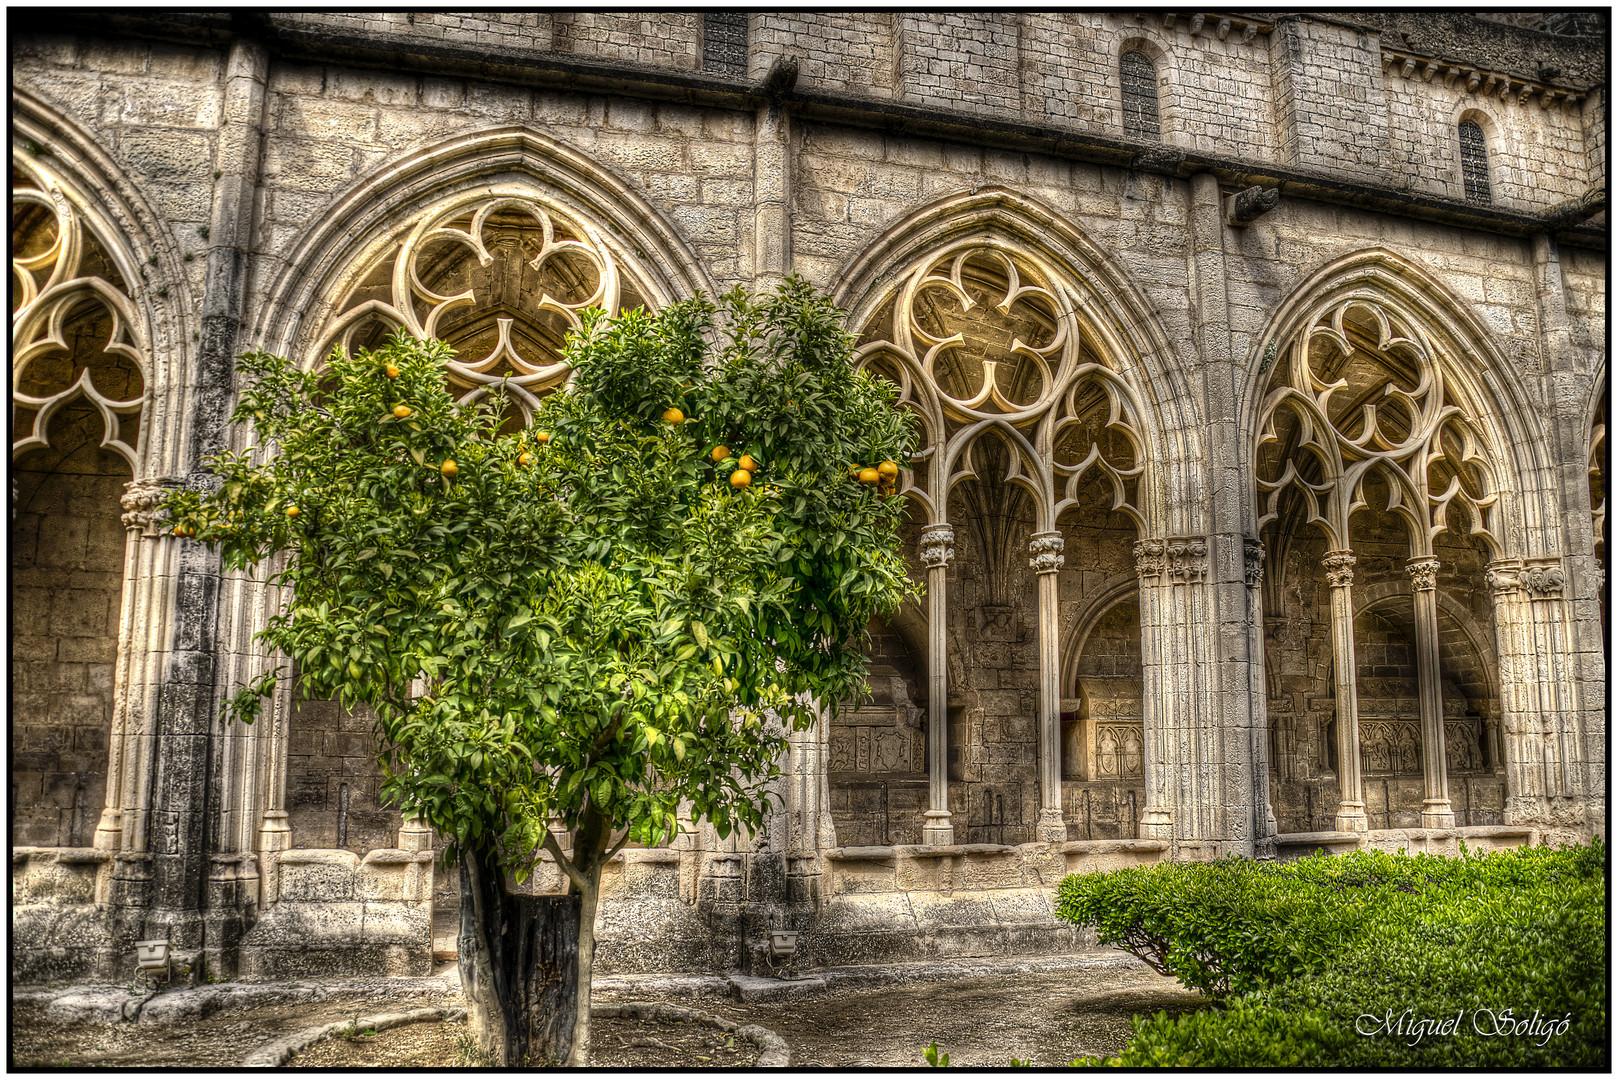 Monasterio de santas creus